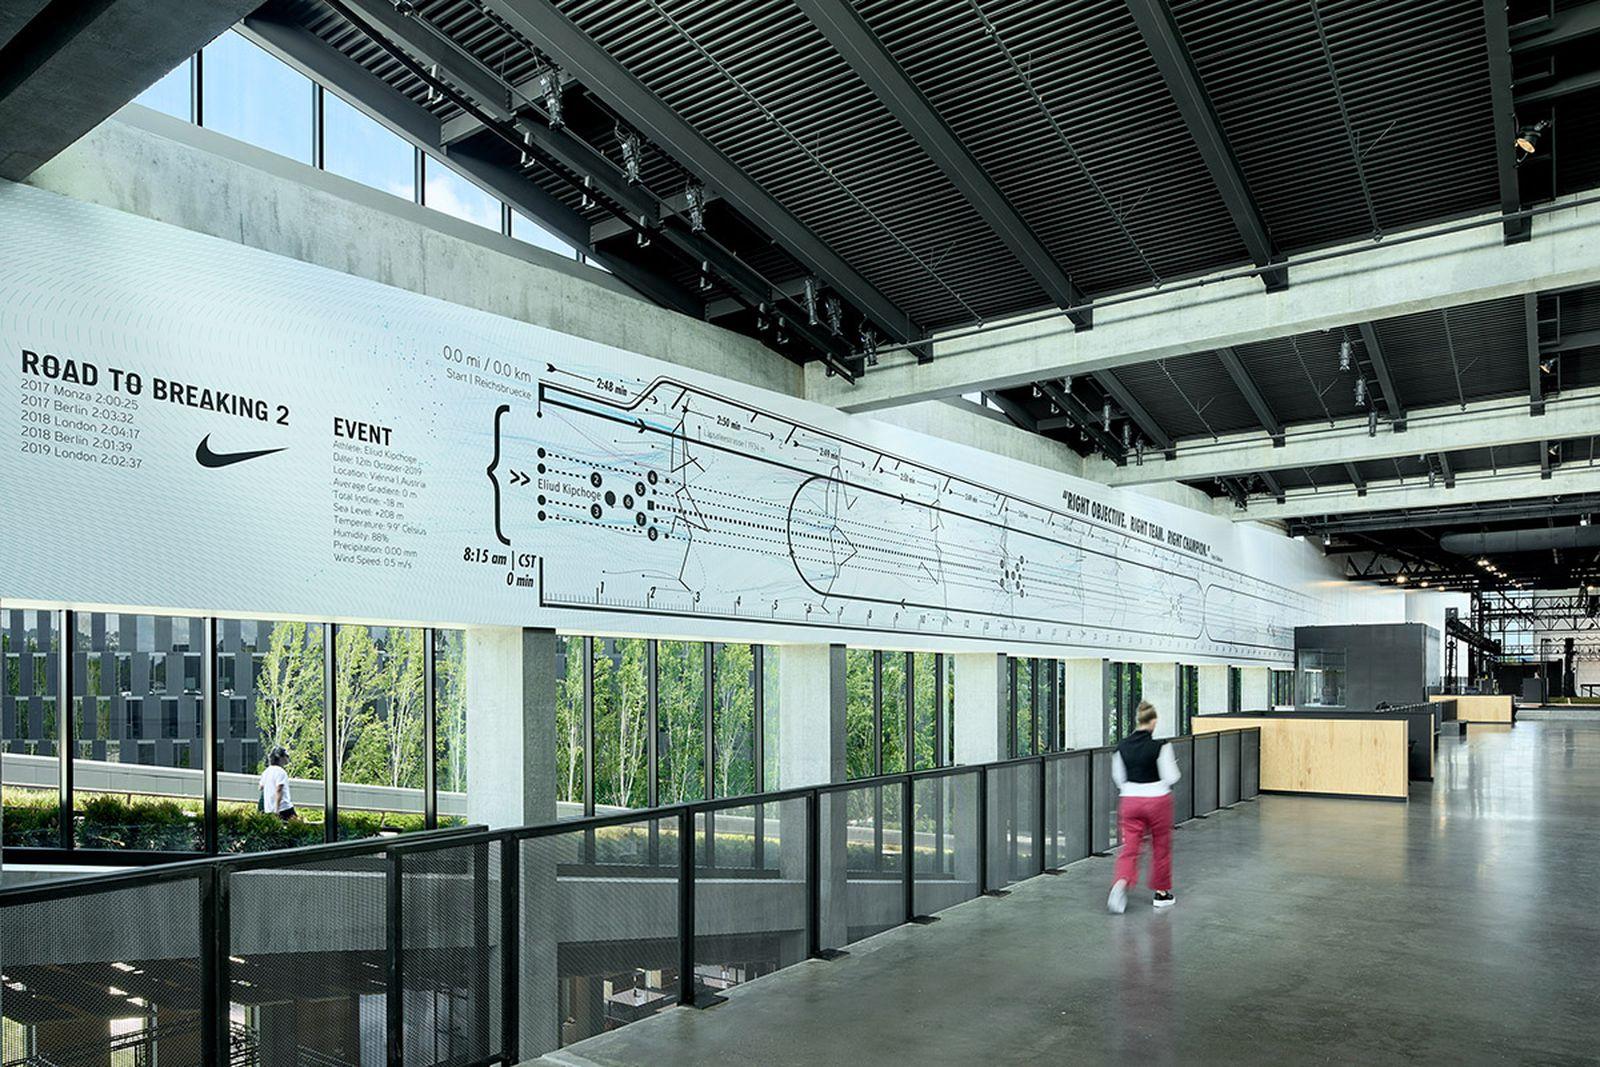 nike-lebron-james-innovation-center- (14)